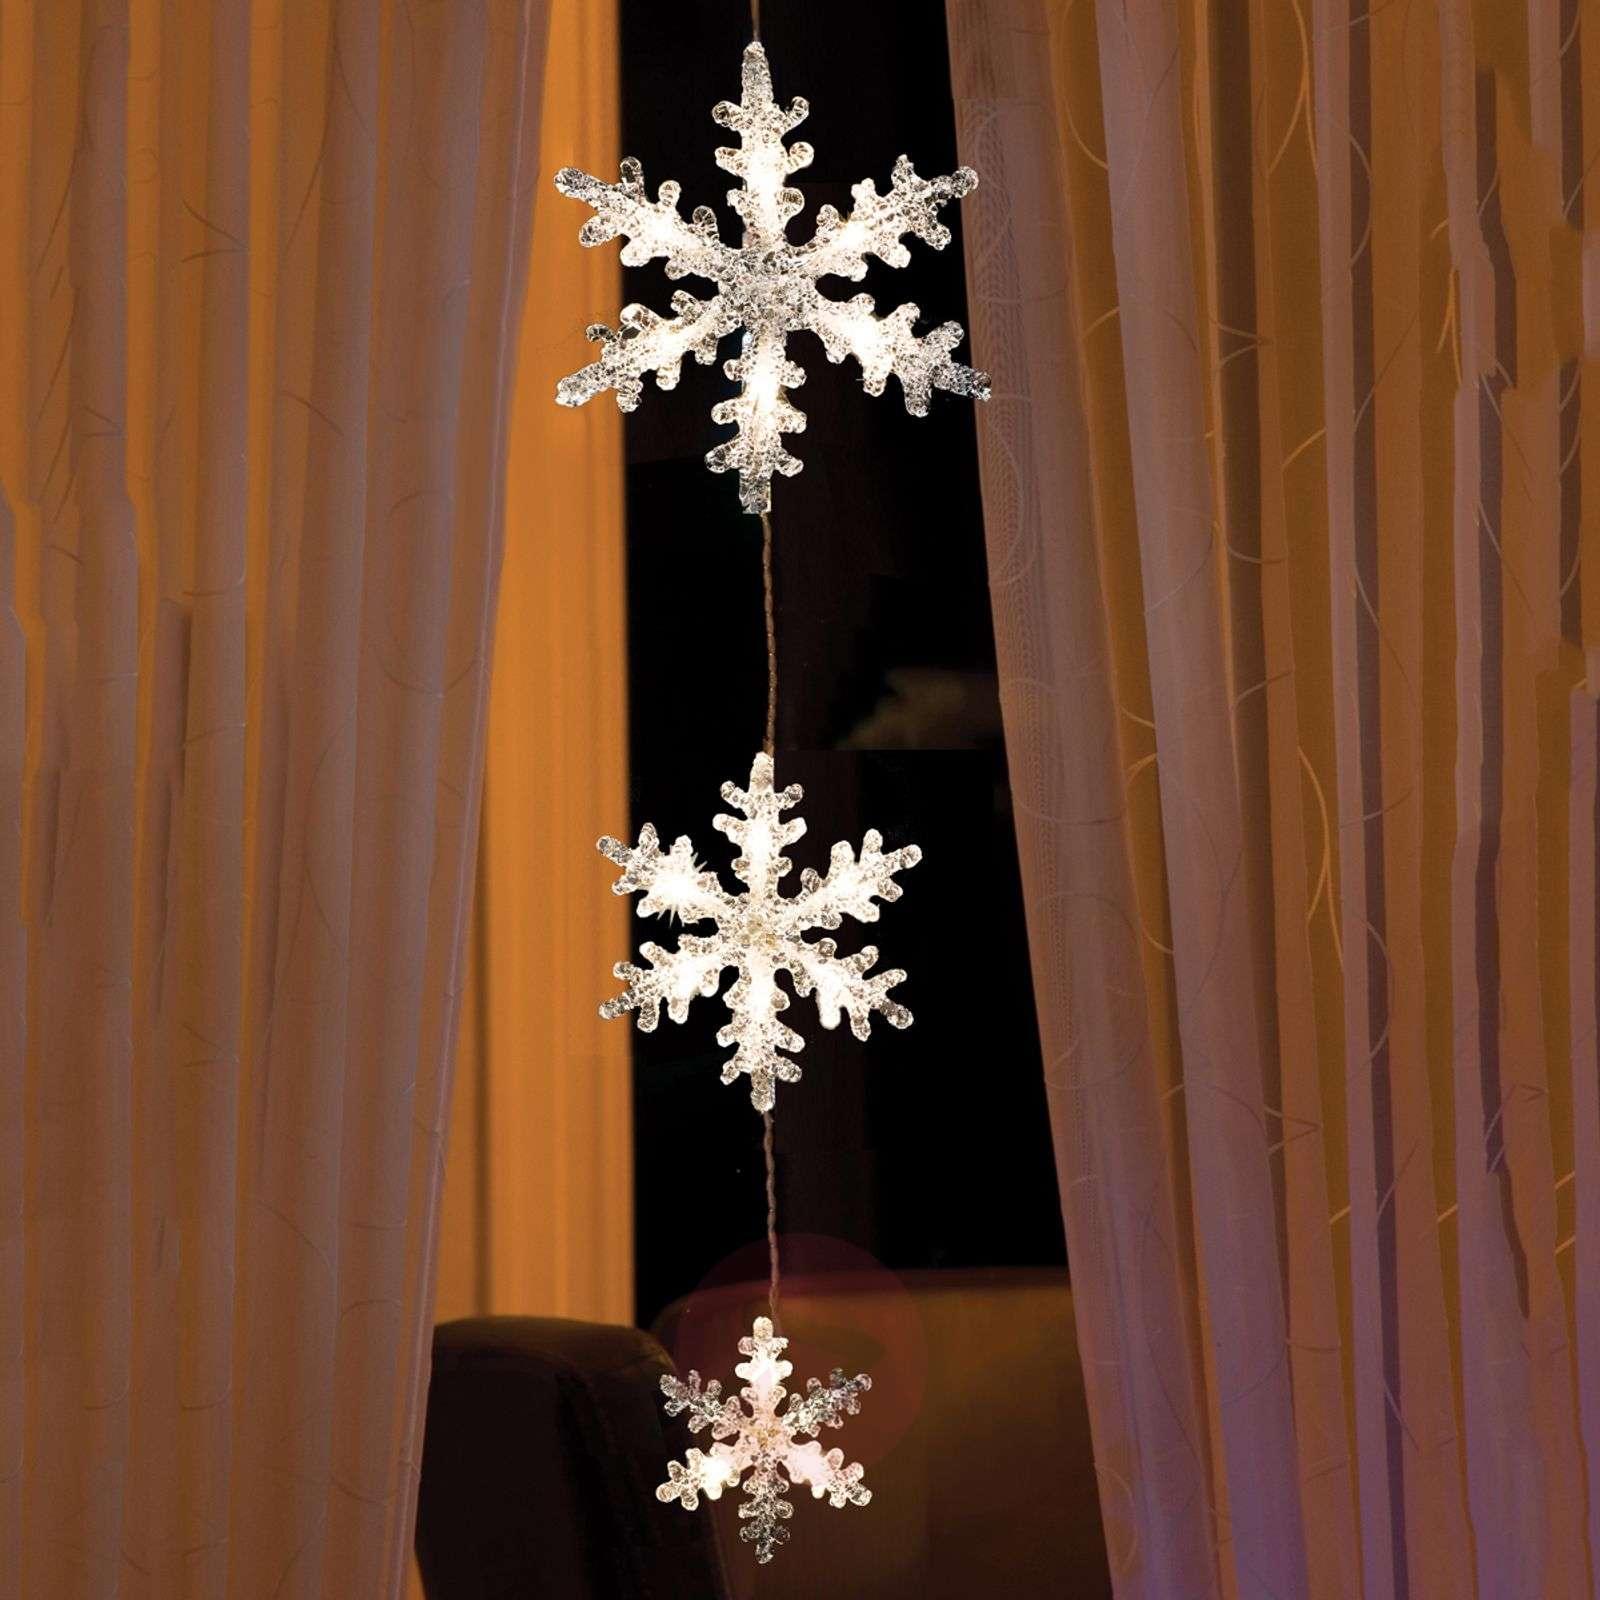 Lumoava LED-valoketju Lumihiutaleet-5524631-01